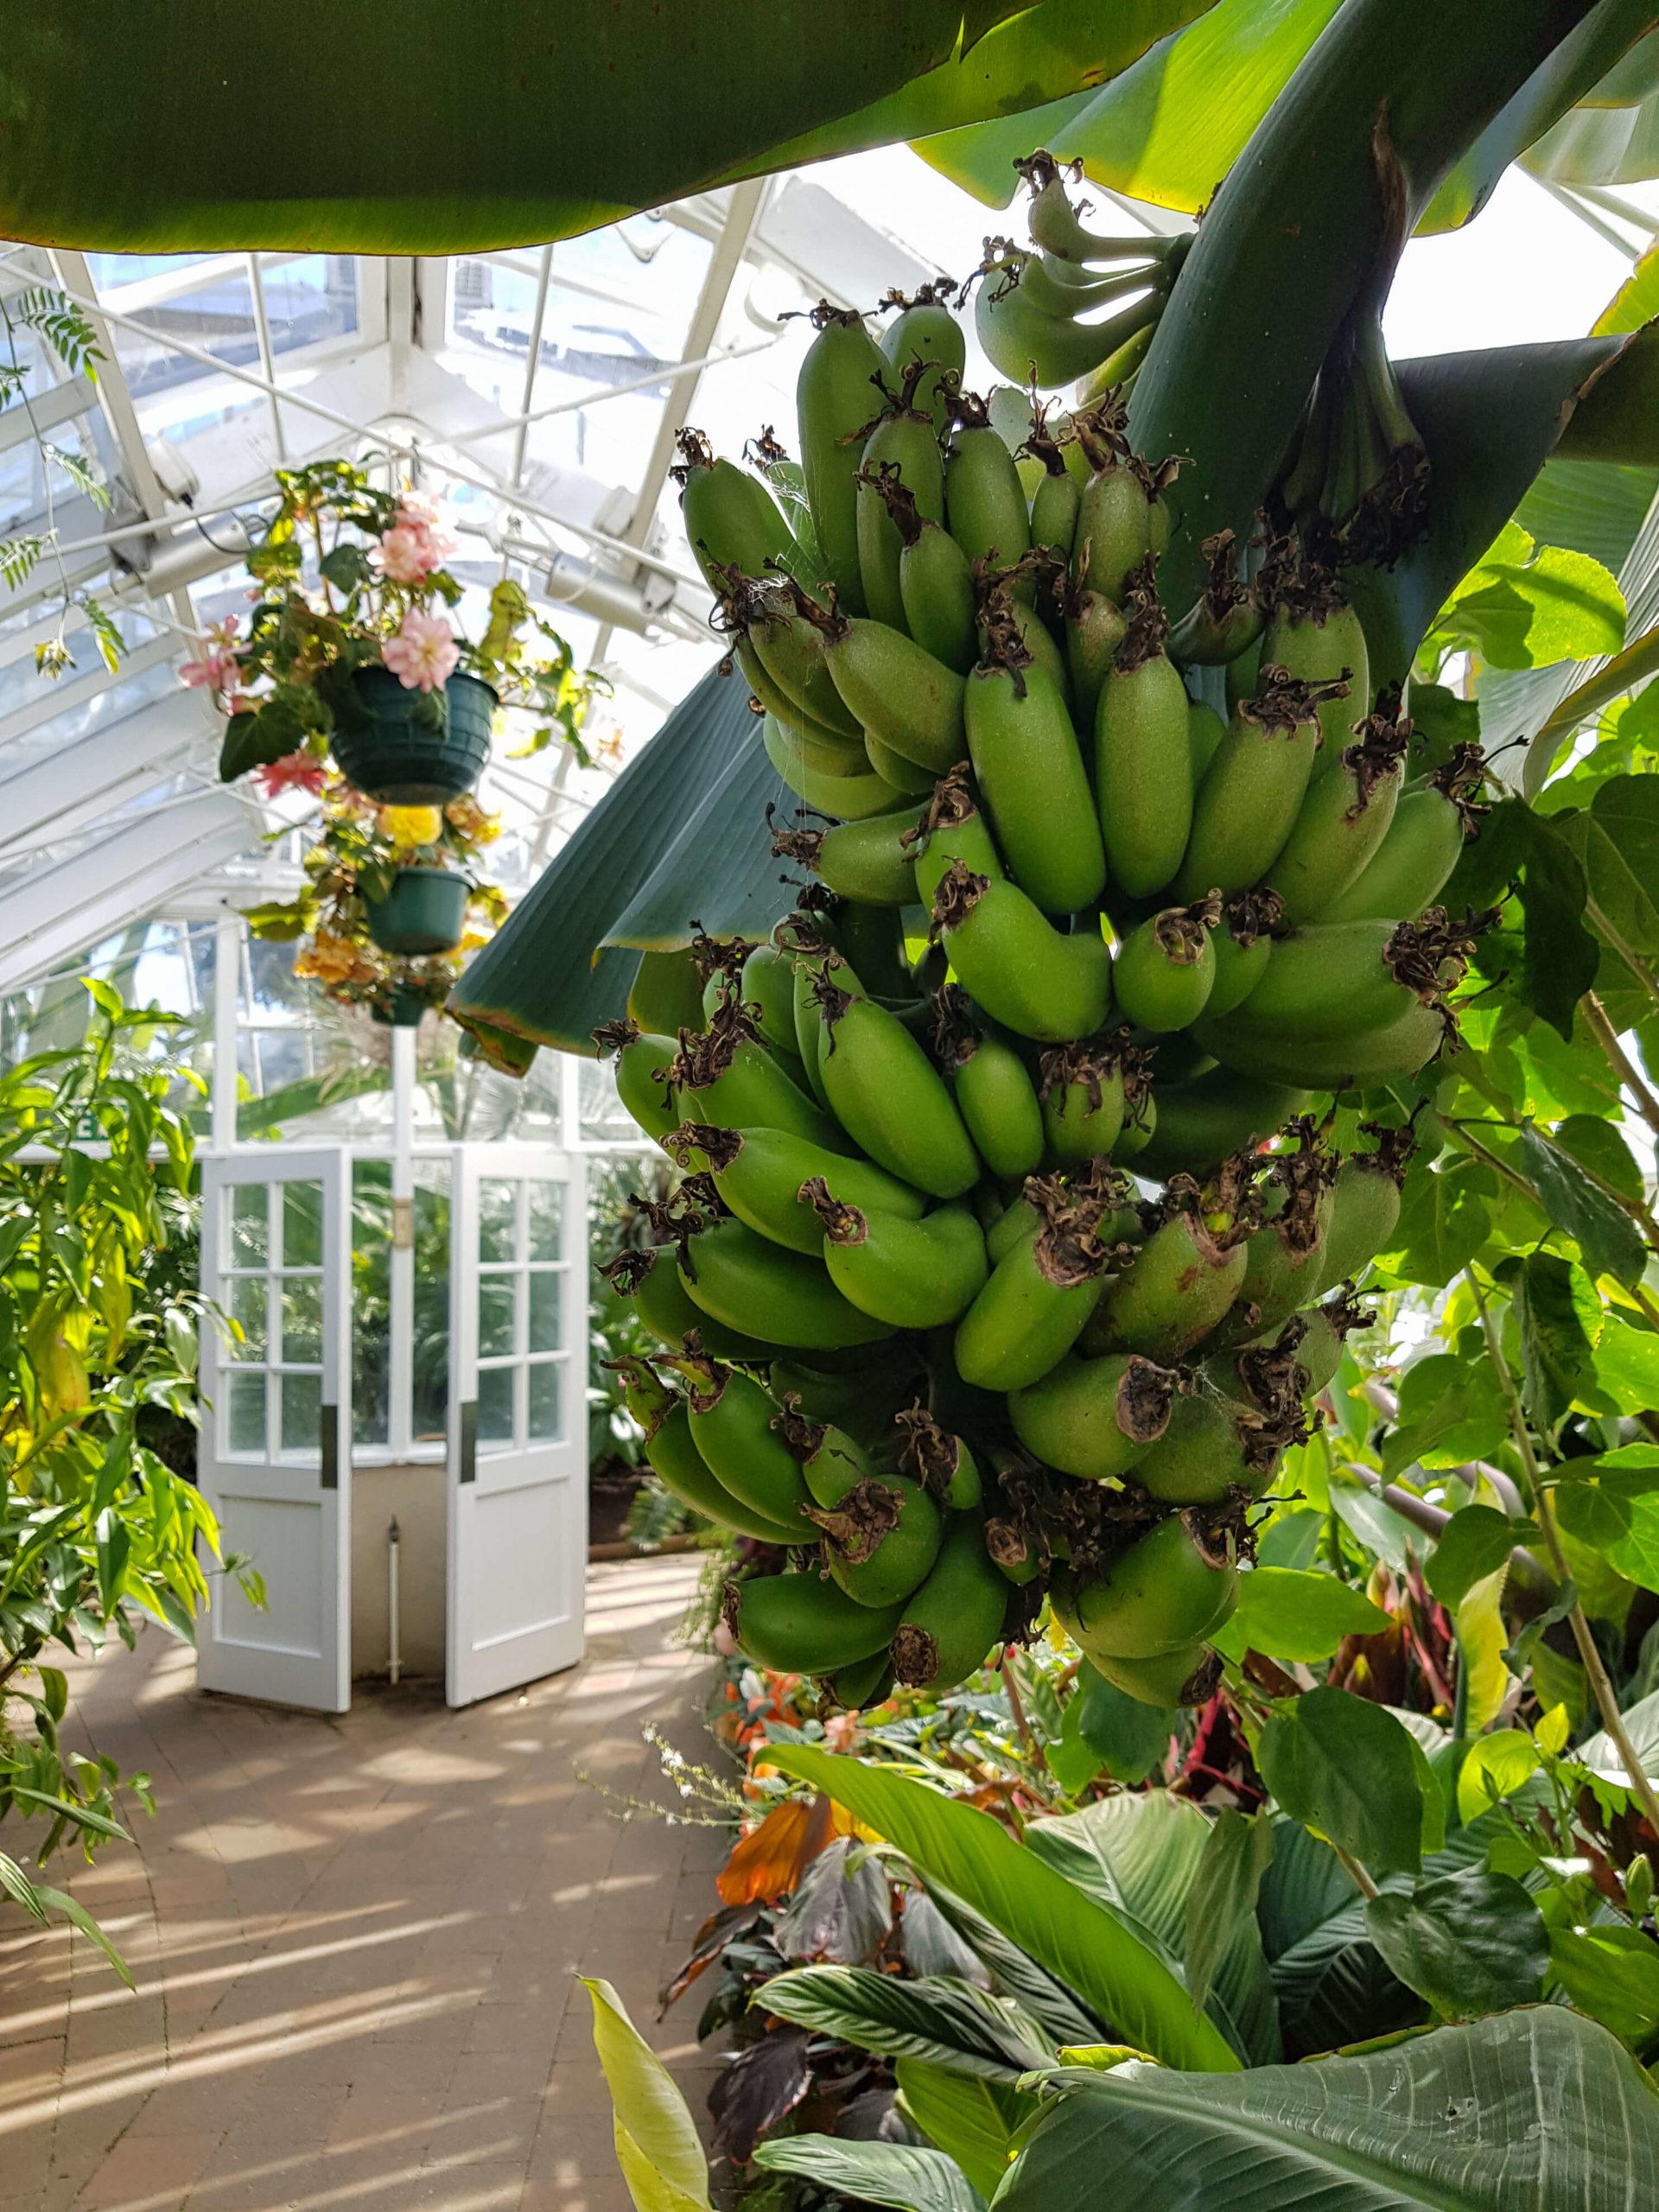 Bananes serre tropicale jardin botanique Dunedin